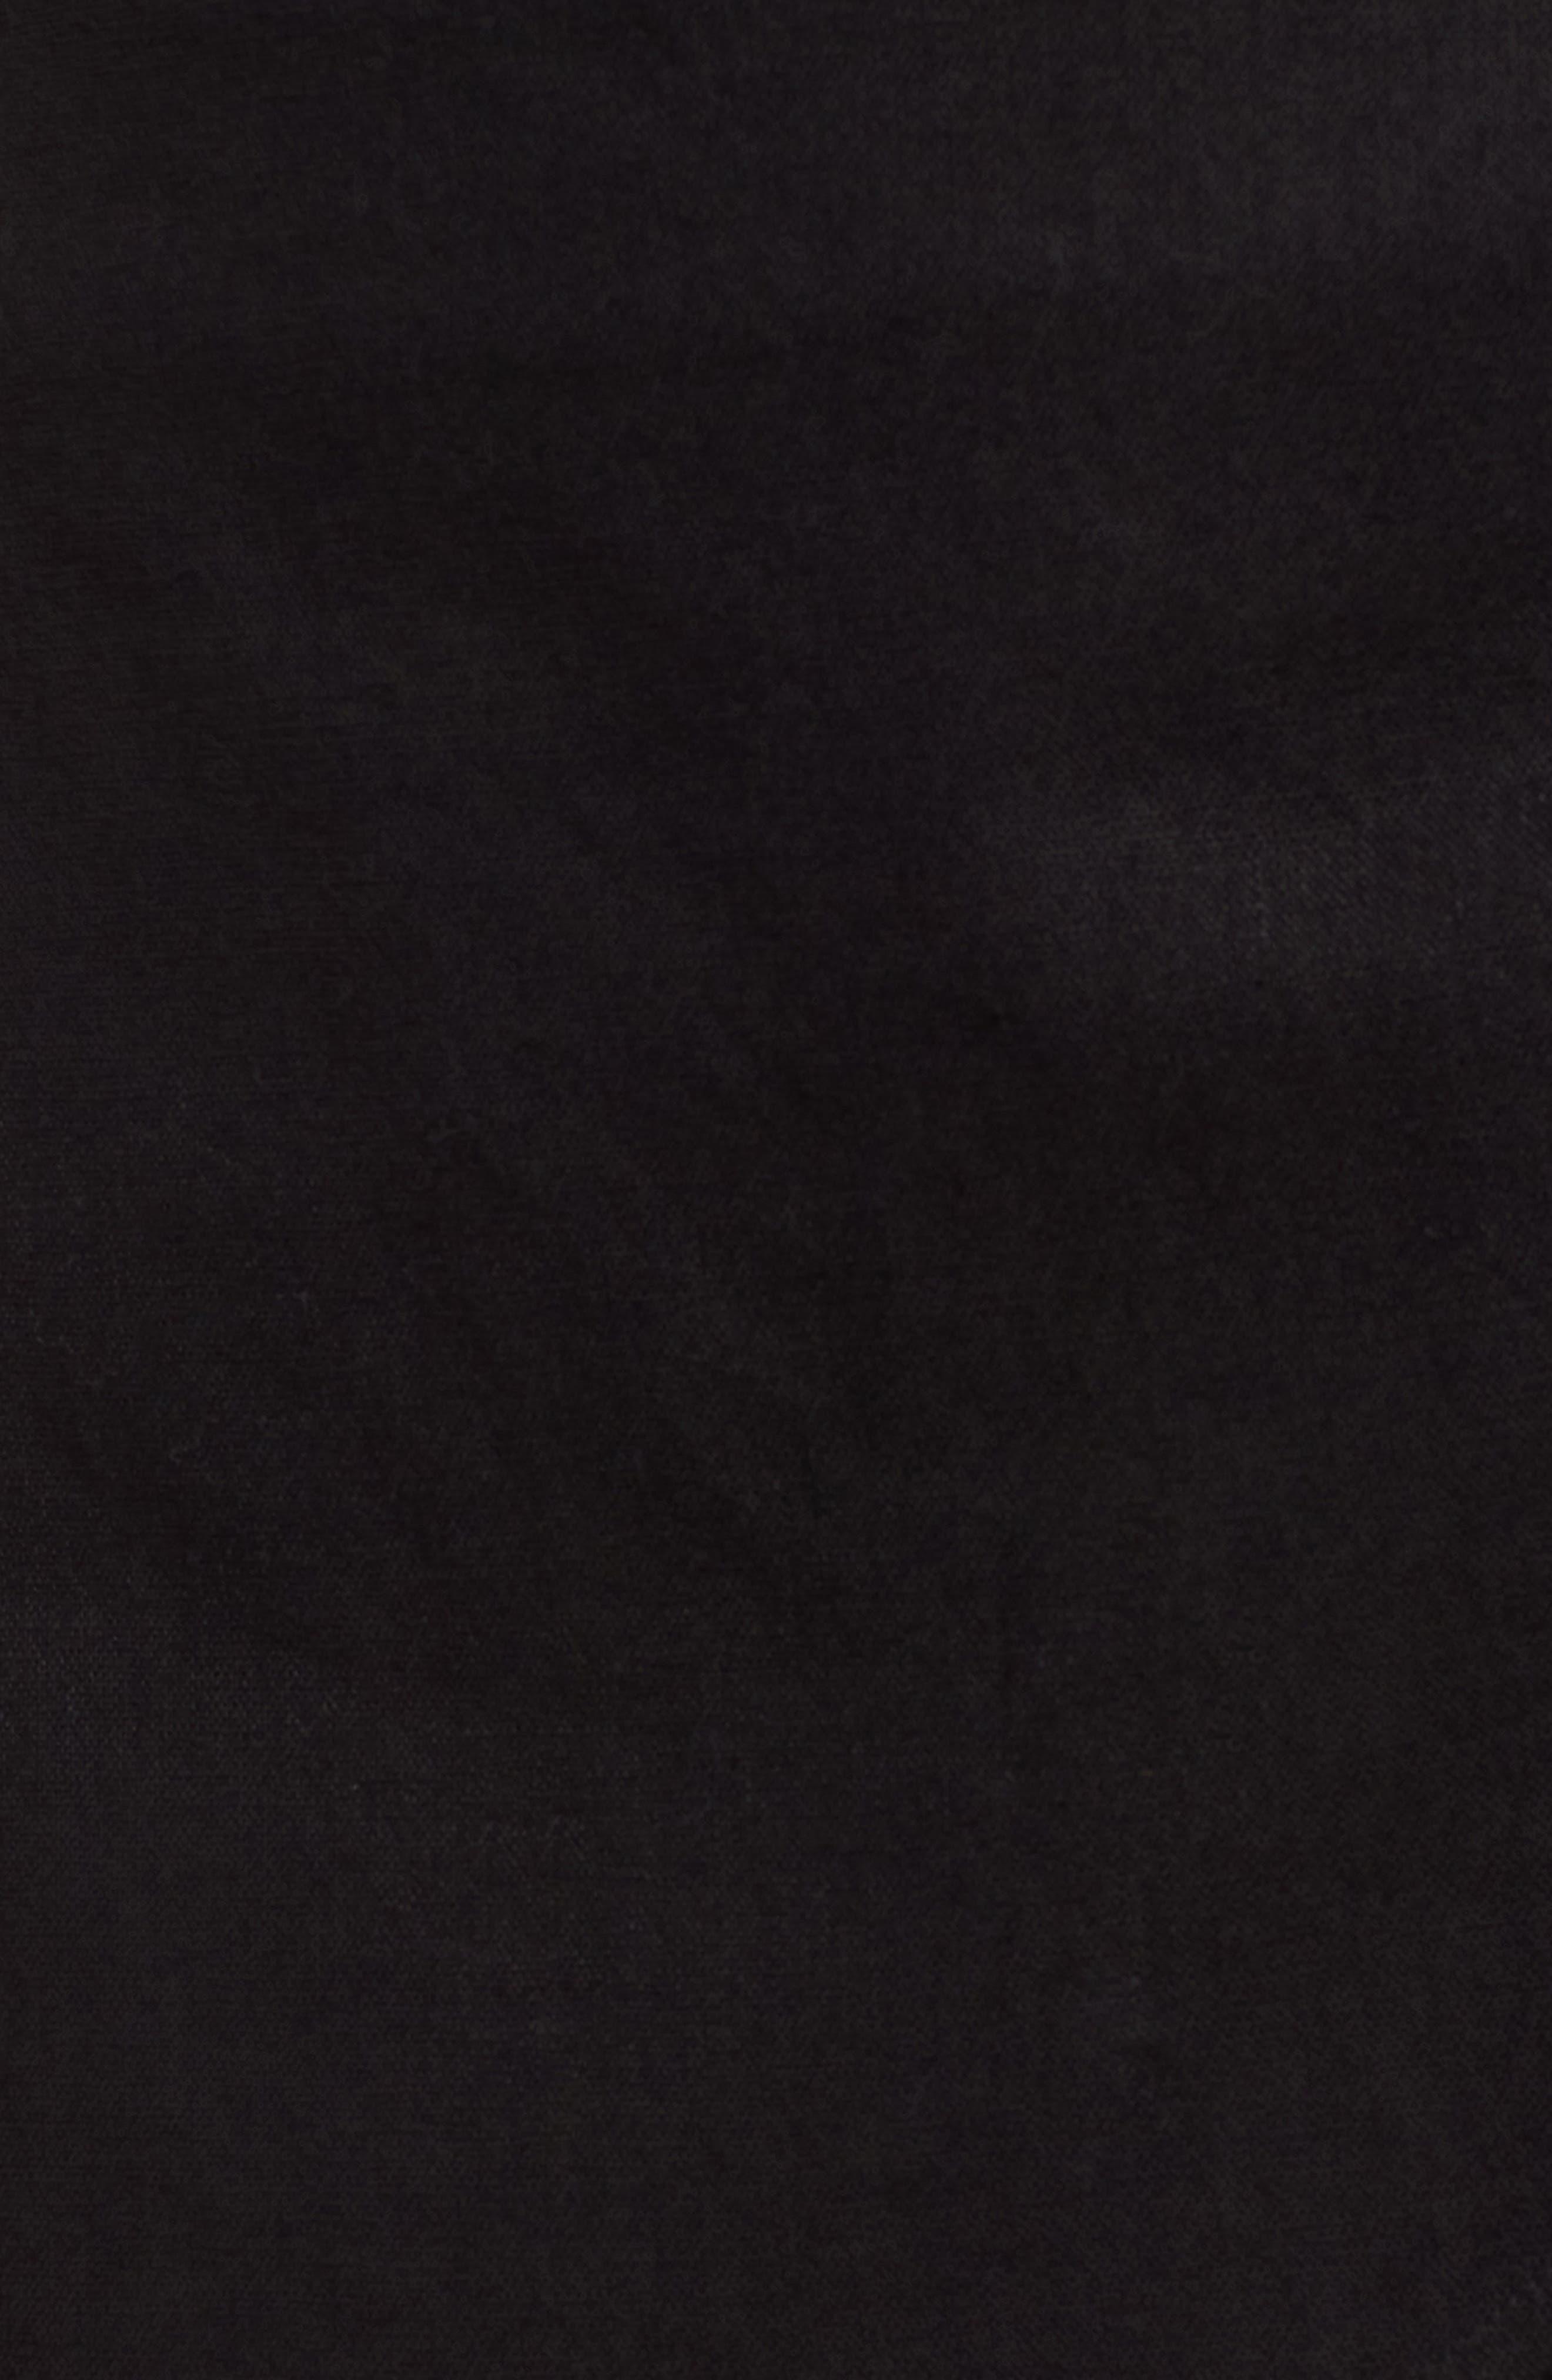 Side Tie Skort,                             Alternate thumbnail 5, color,                             Black